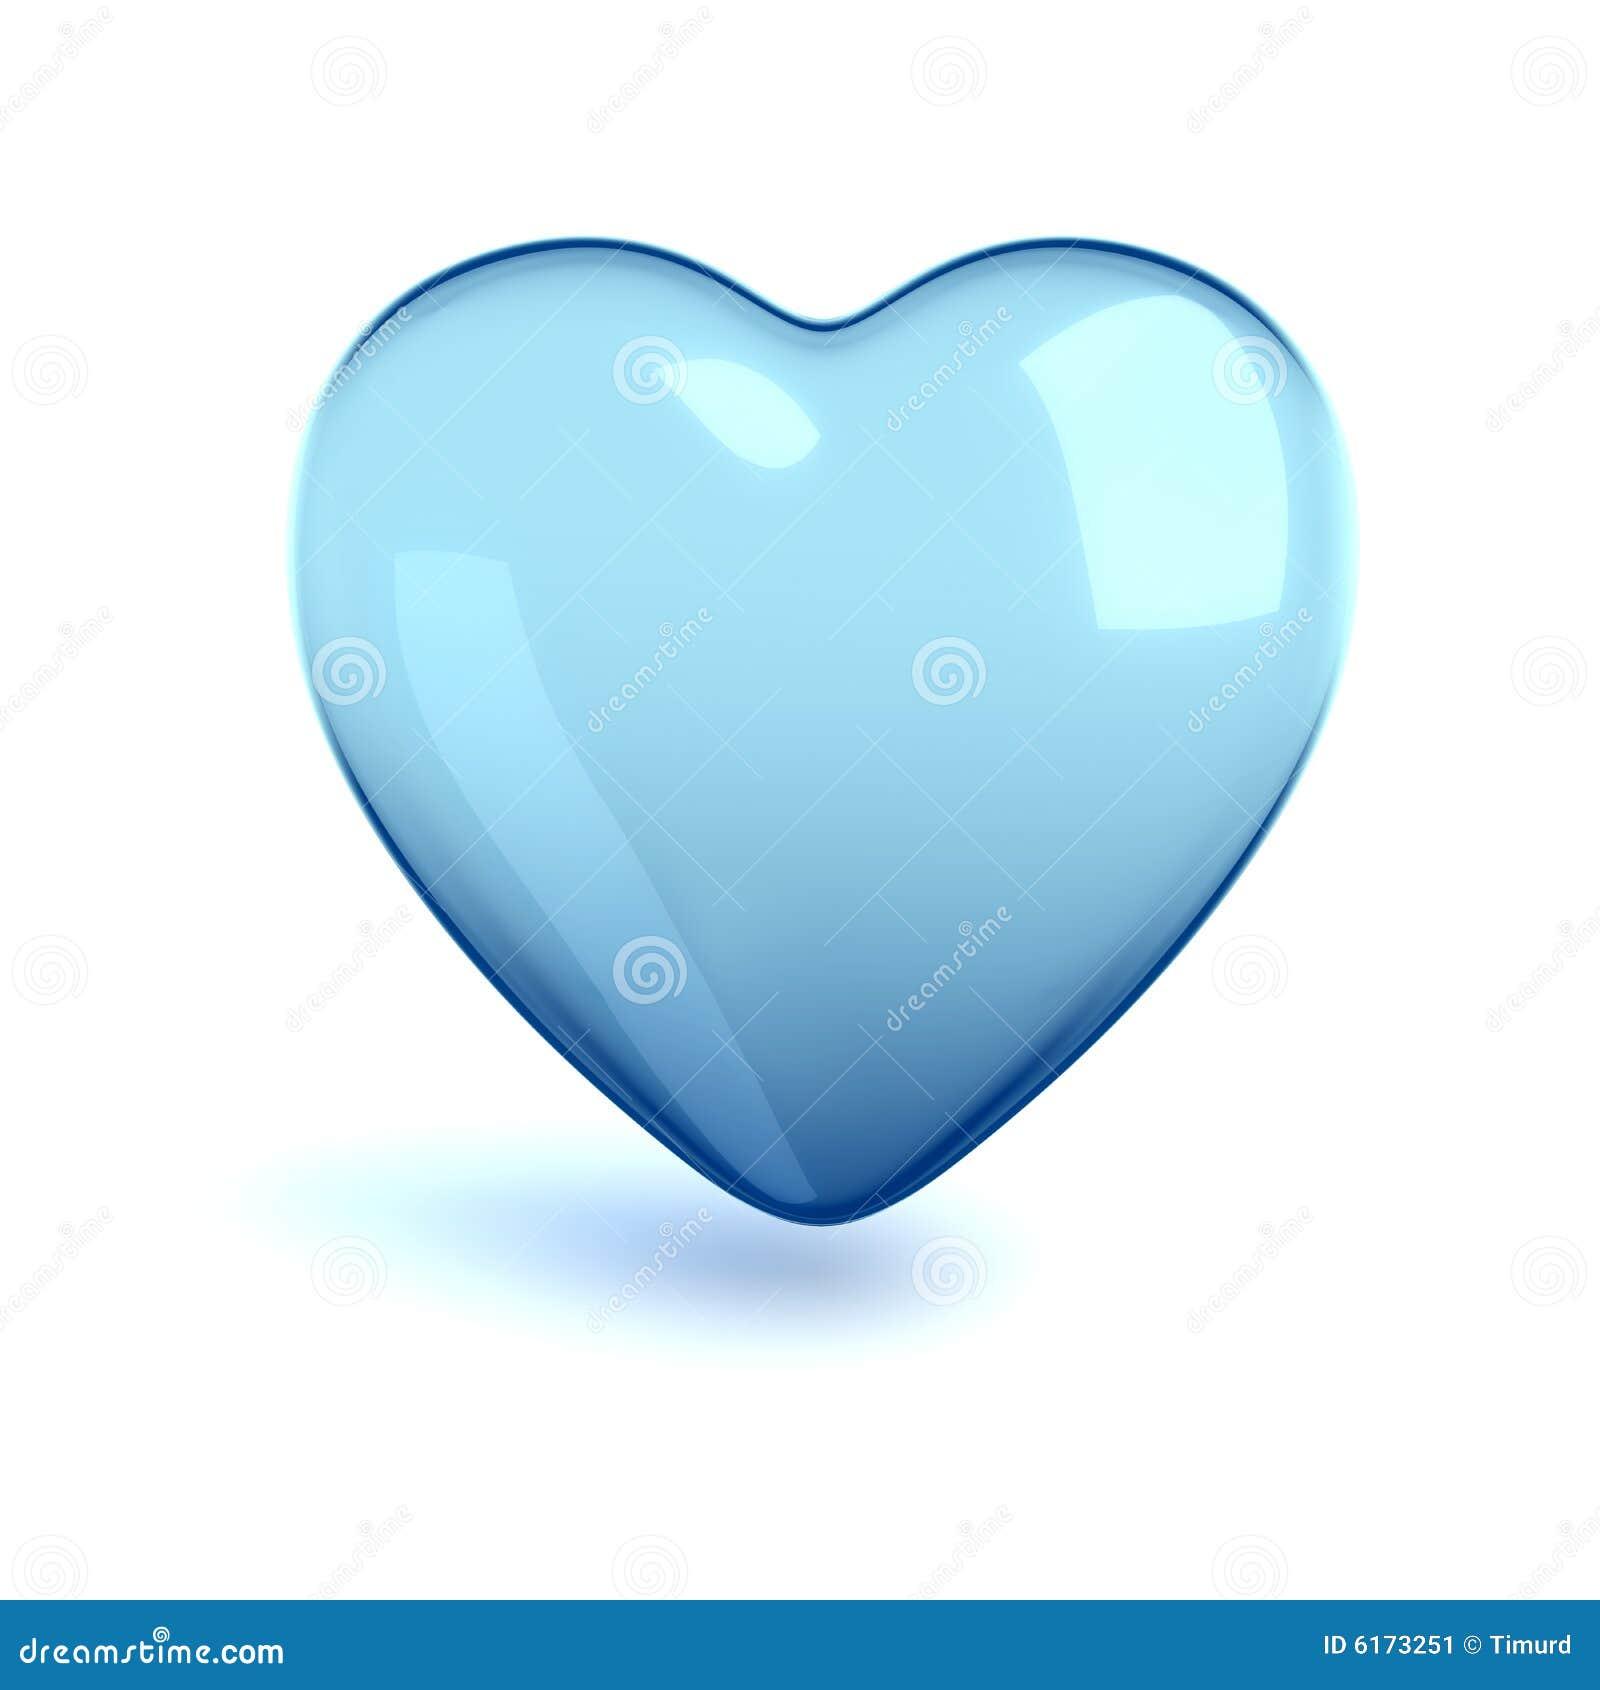 Imagenes De Baño Frio:Glass Heart